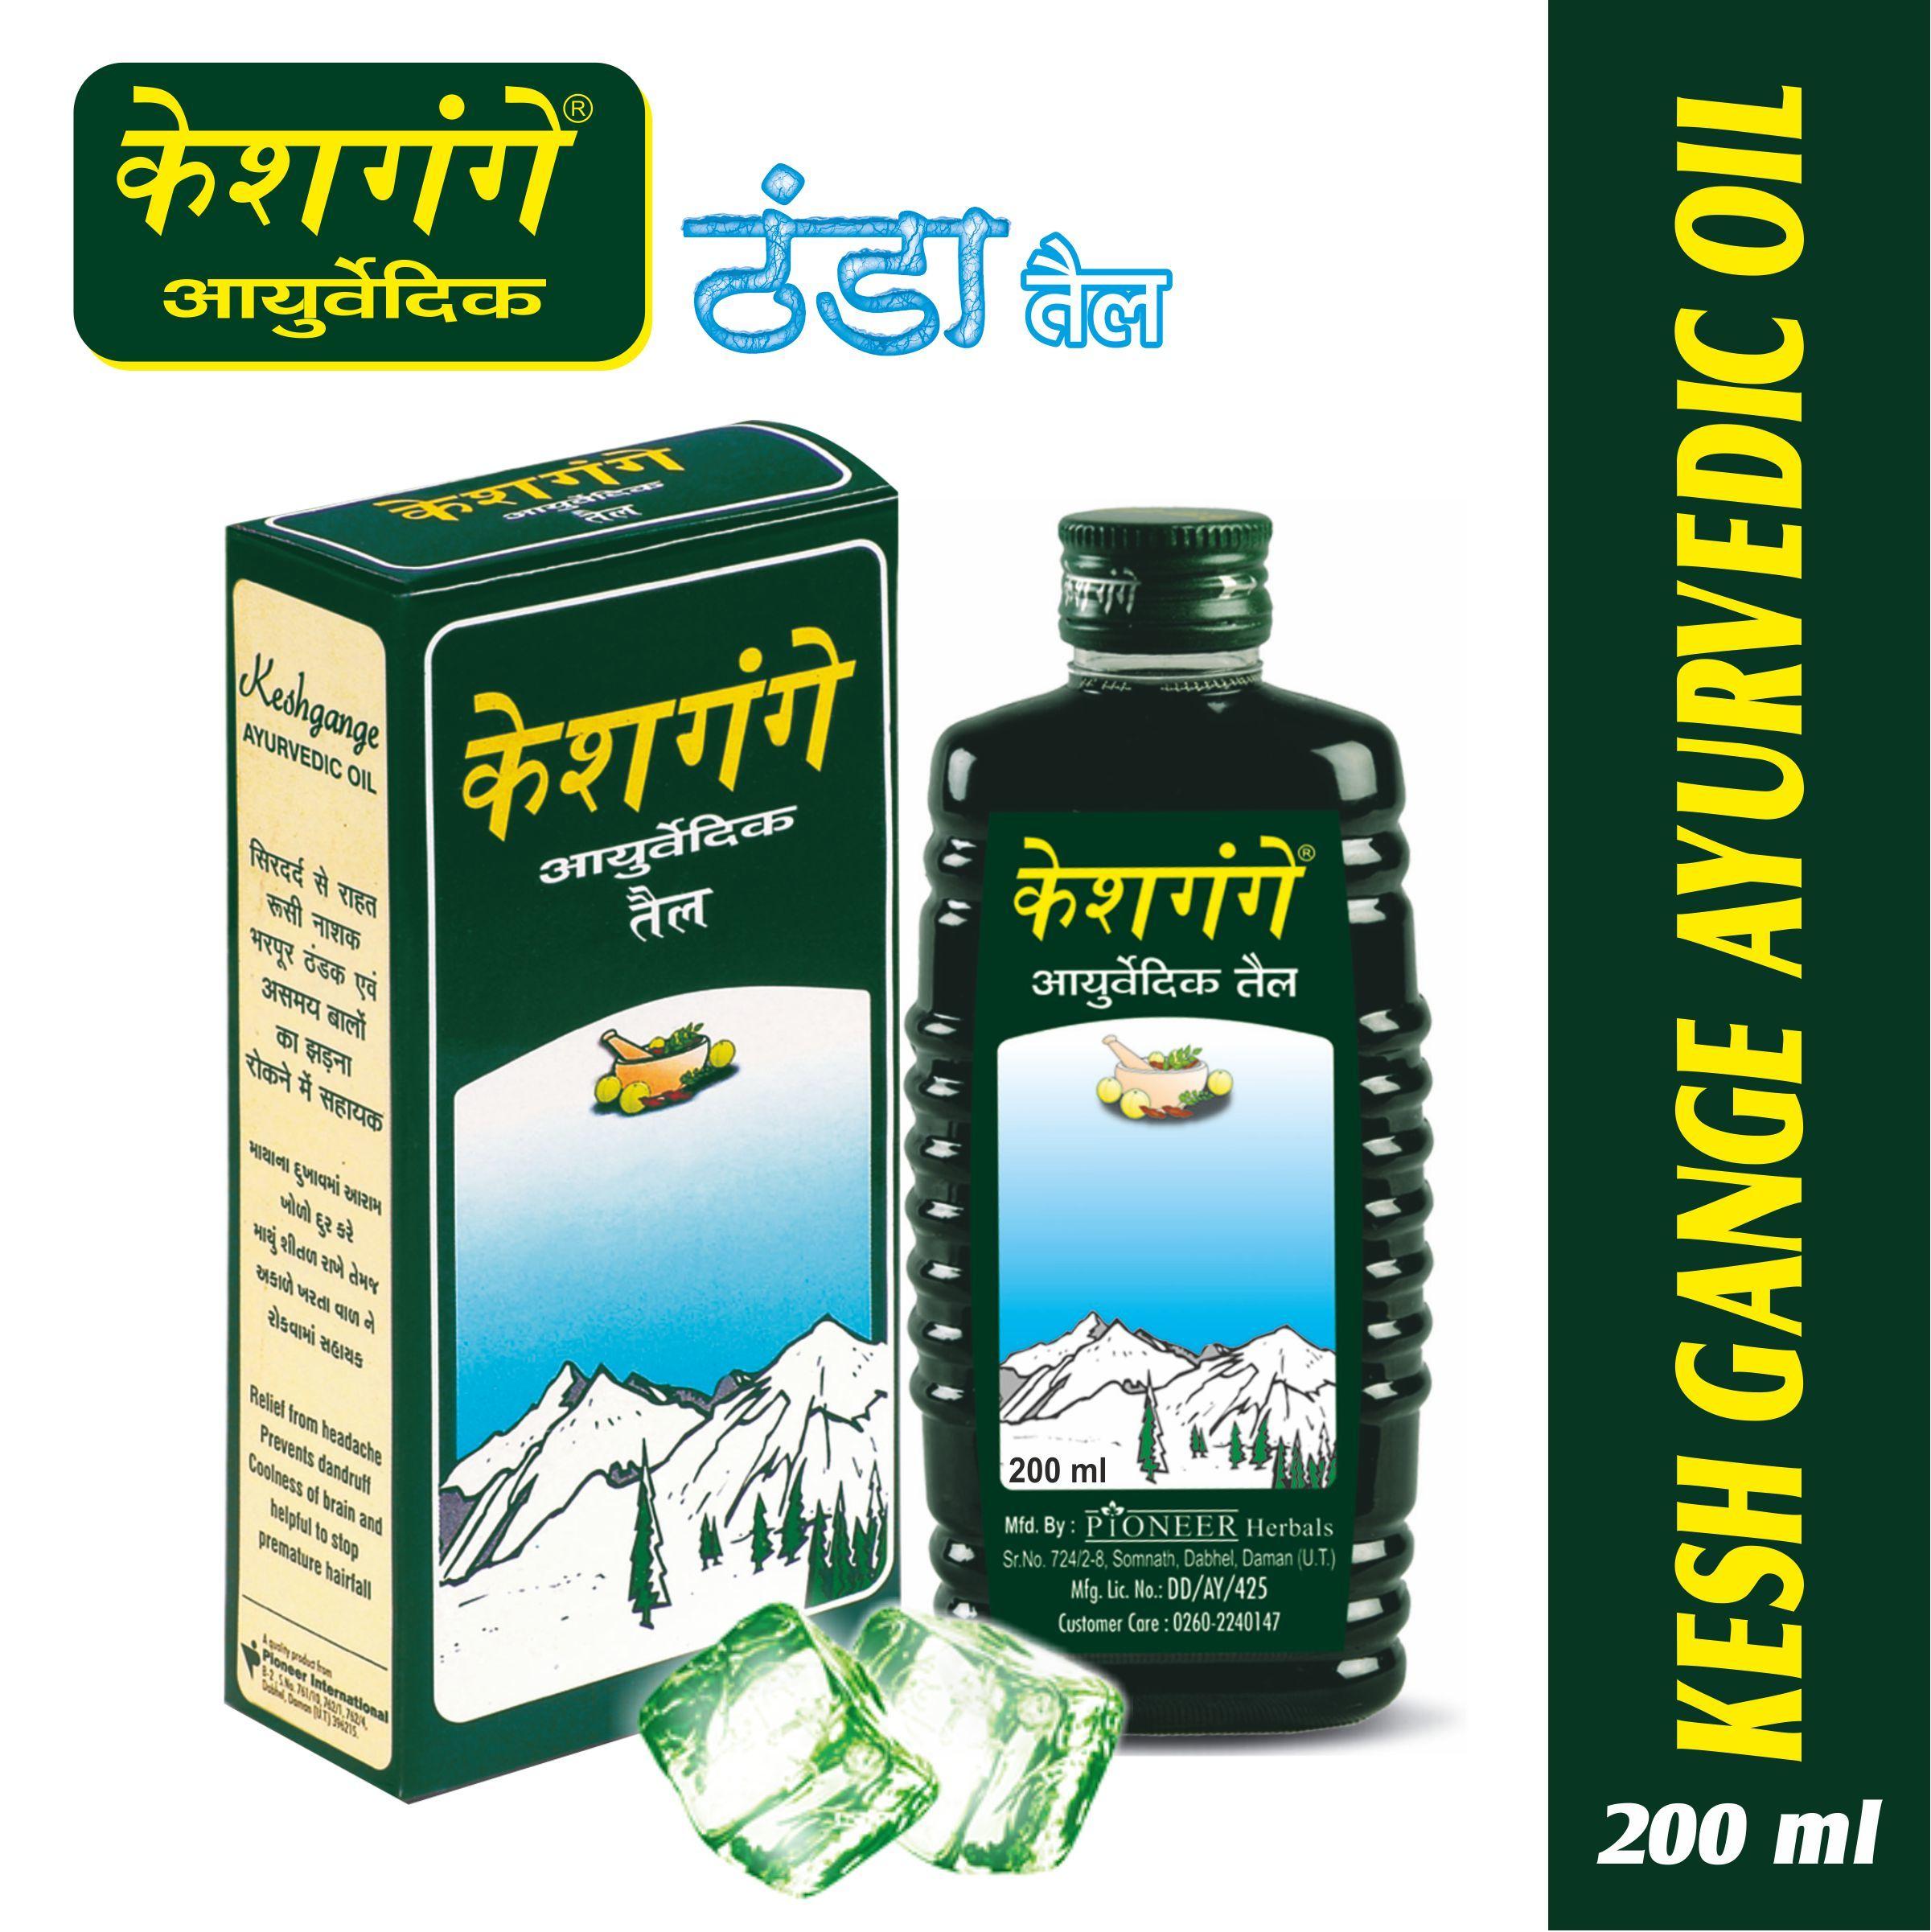 Keshgange Ayurvedic Cool Oil Thanda Tel 50ml - 500ml